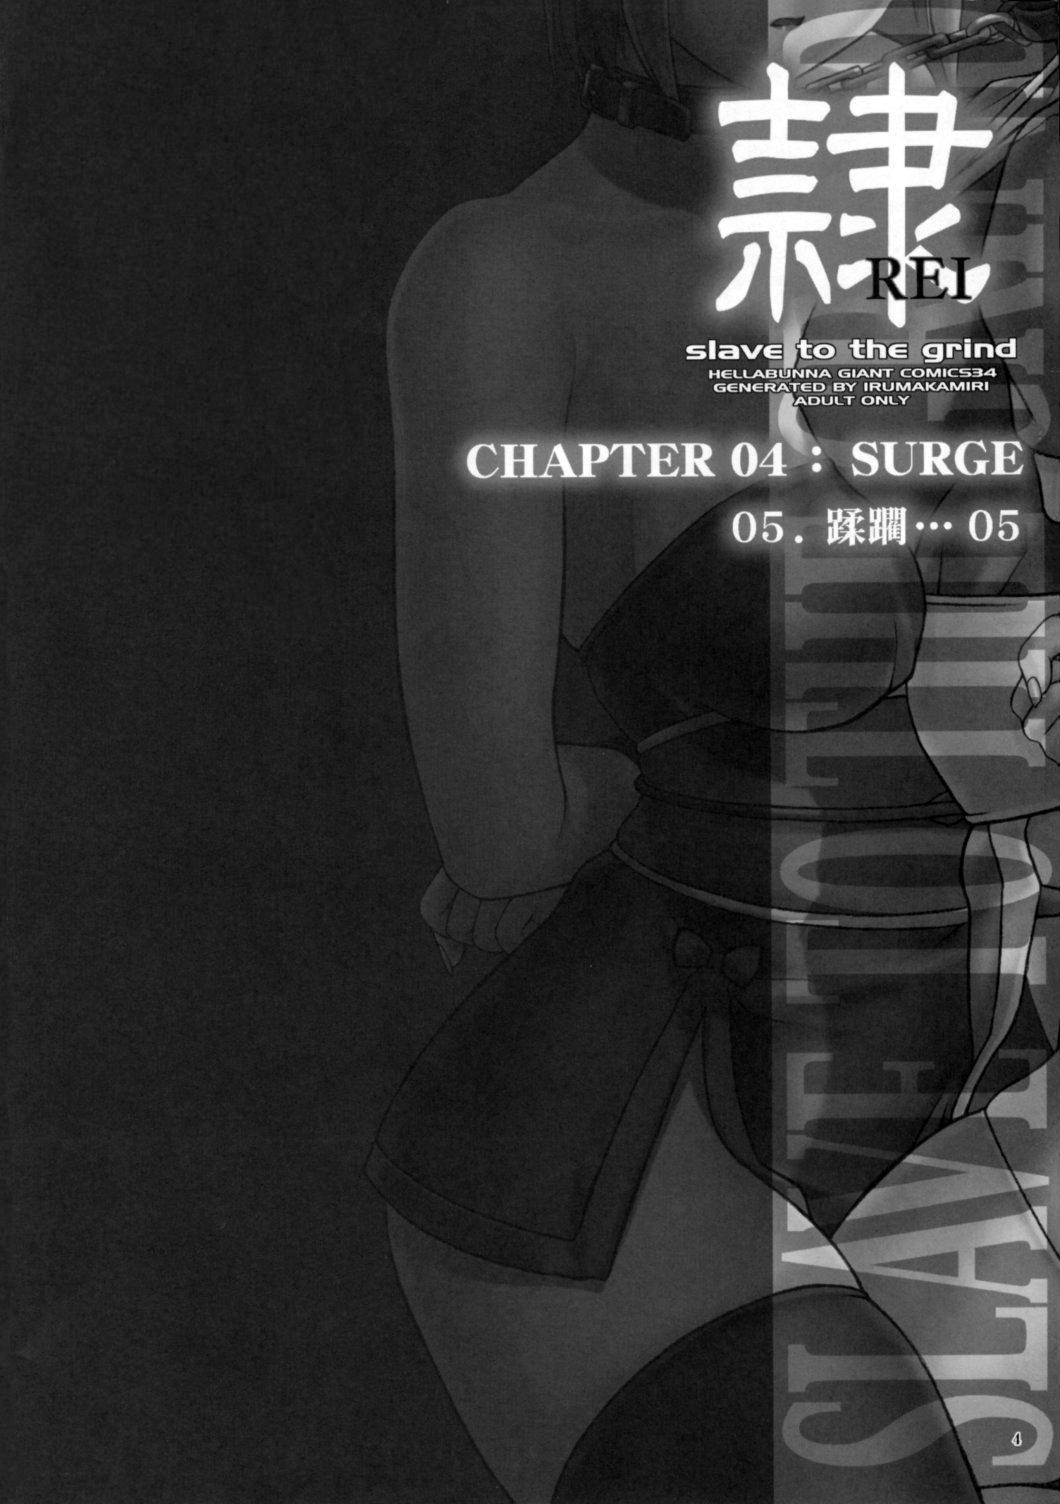 (C72) [Hellabunna (Iruma Kamiri)] REI - slave to the grind - CHAPTER 04: SURGE (Dead or Alive) [English] [Kletian] 2